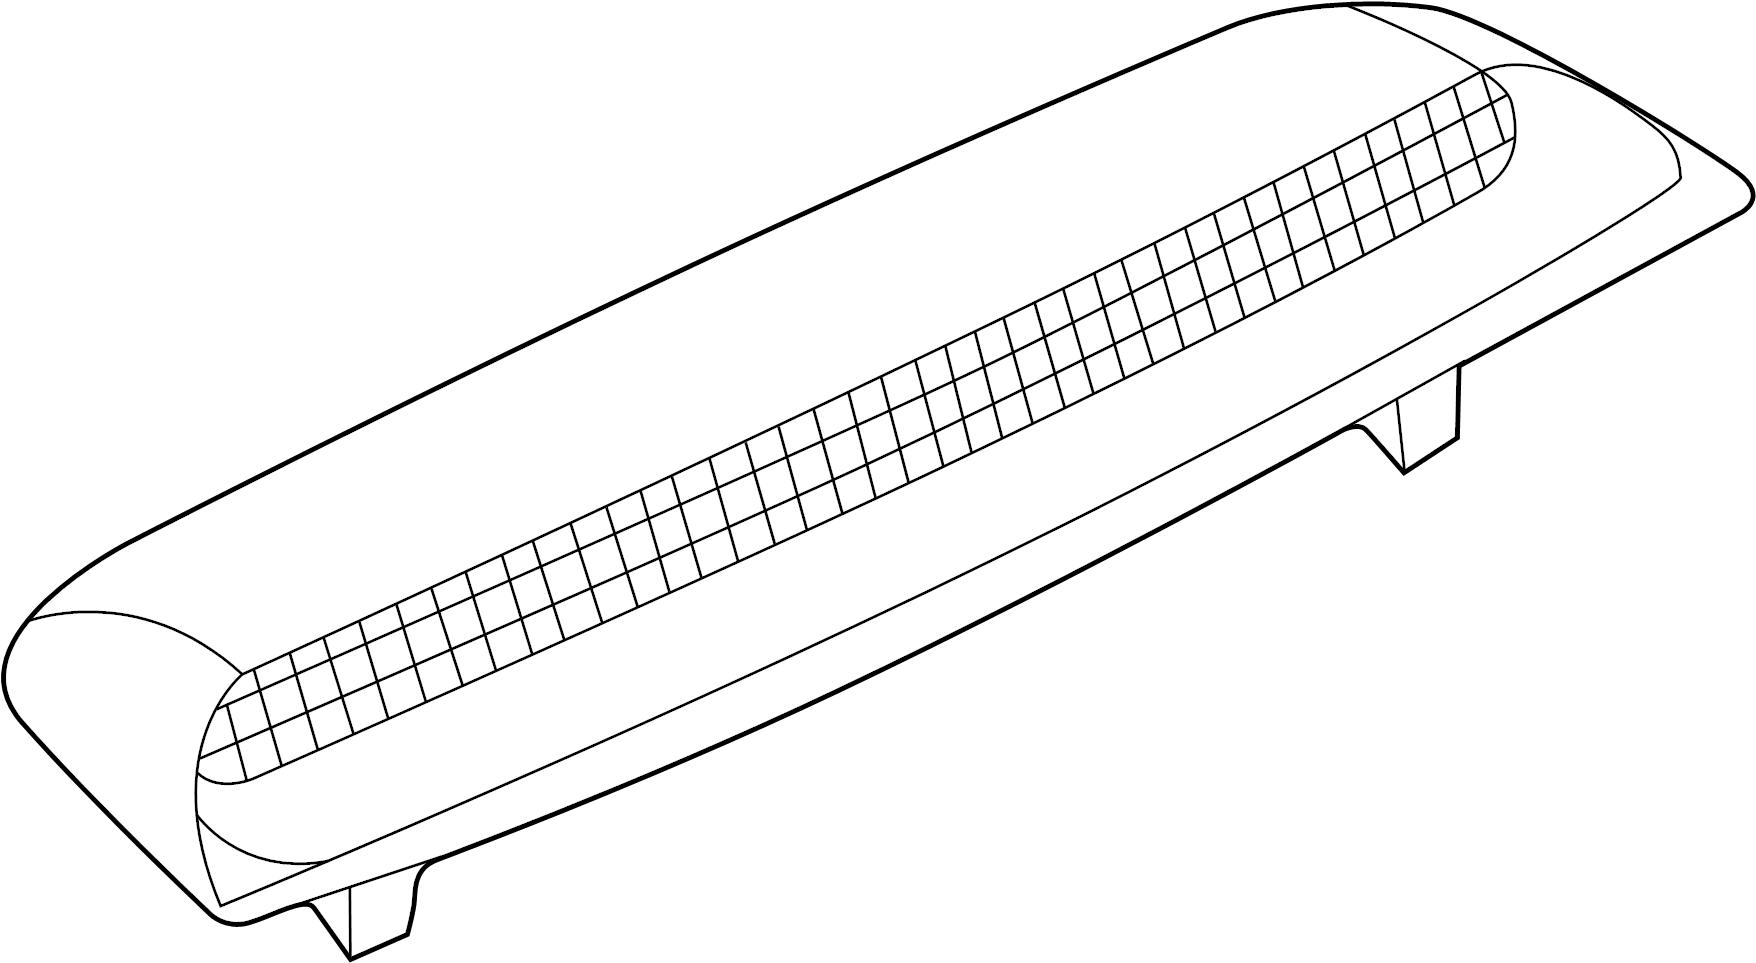 1999 vw passat engine diagram federal signal pa300 siren wiring volkswagen diagrams html imageresizertool com